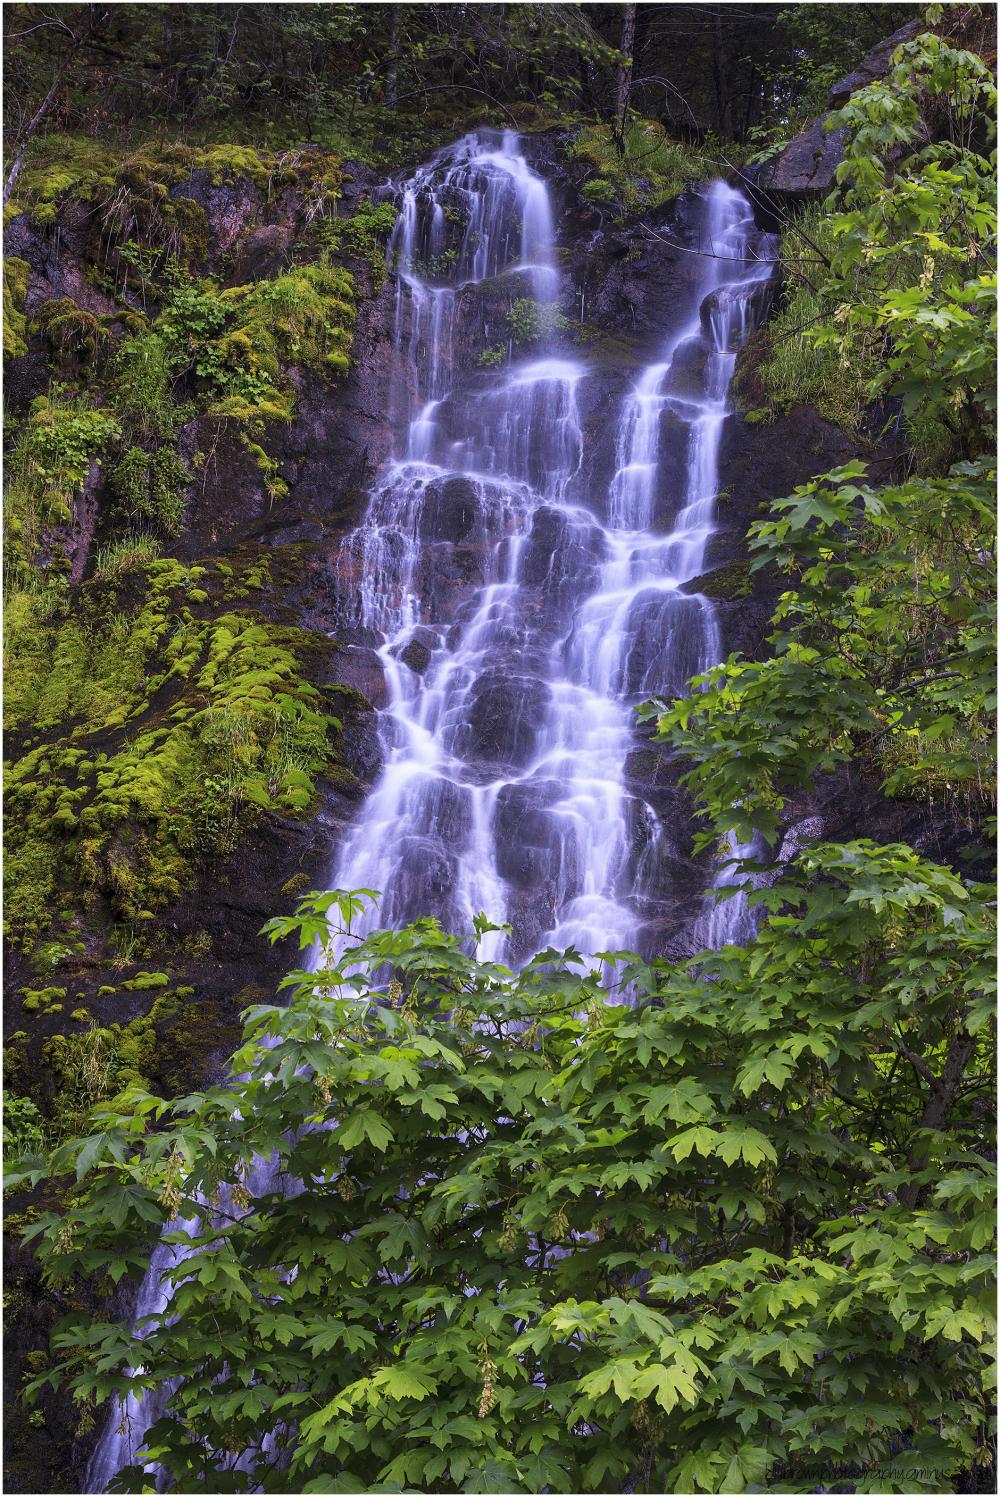 Bridal Veil Falls, Highway 50